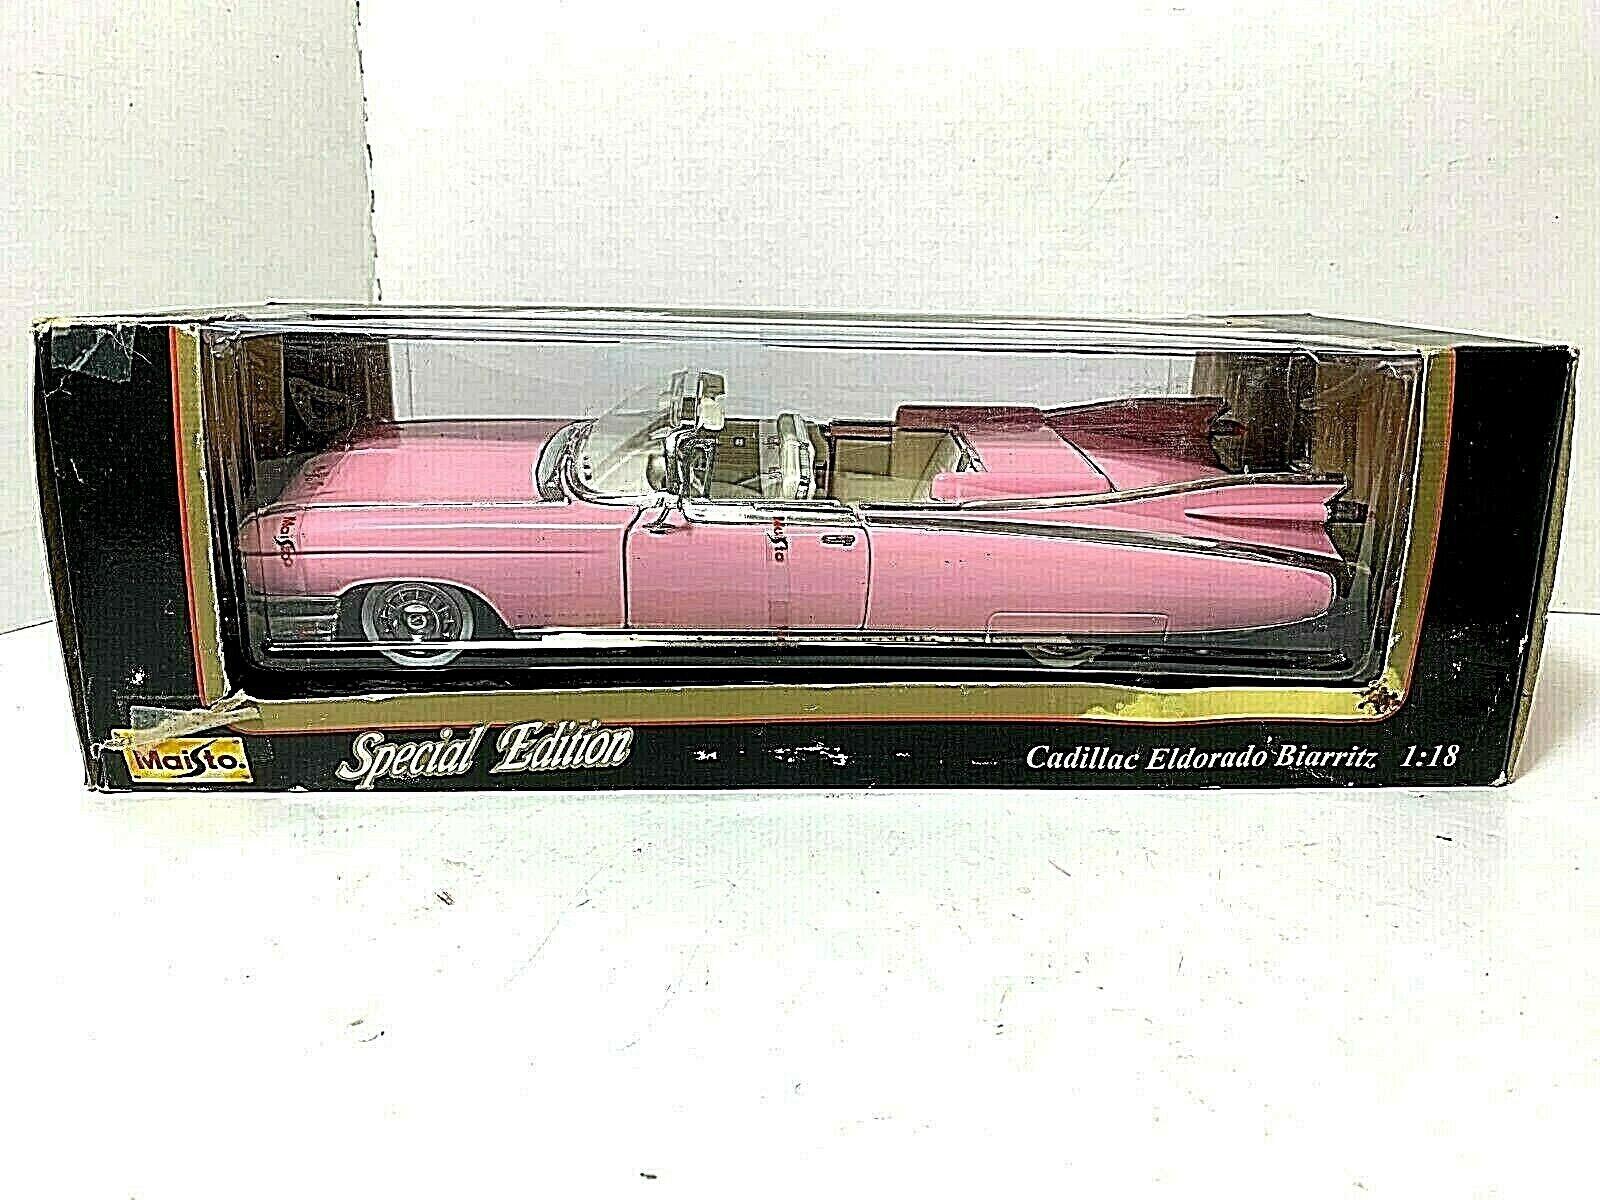 Maisto  '1959 Cadillac Edldorado Biarritz Congreenible' Congreenible' Congreenible'   Die-Cast   1 18 c5356c